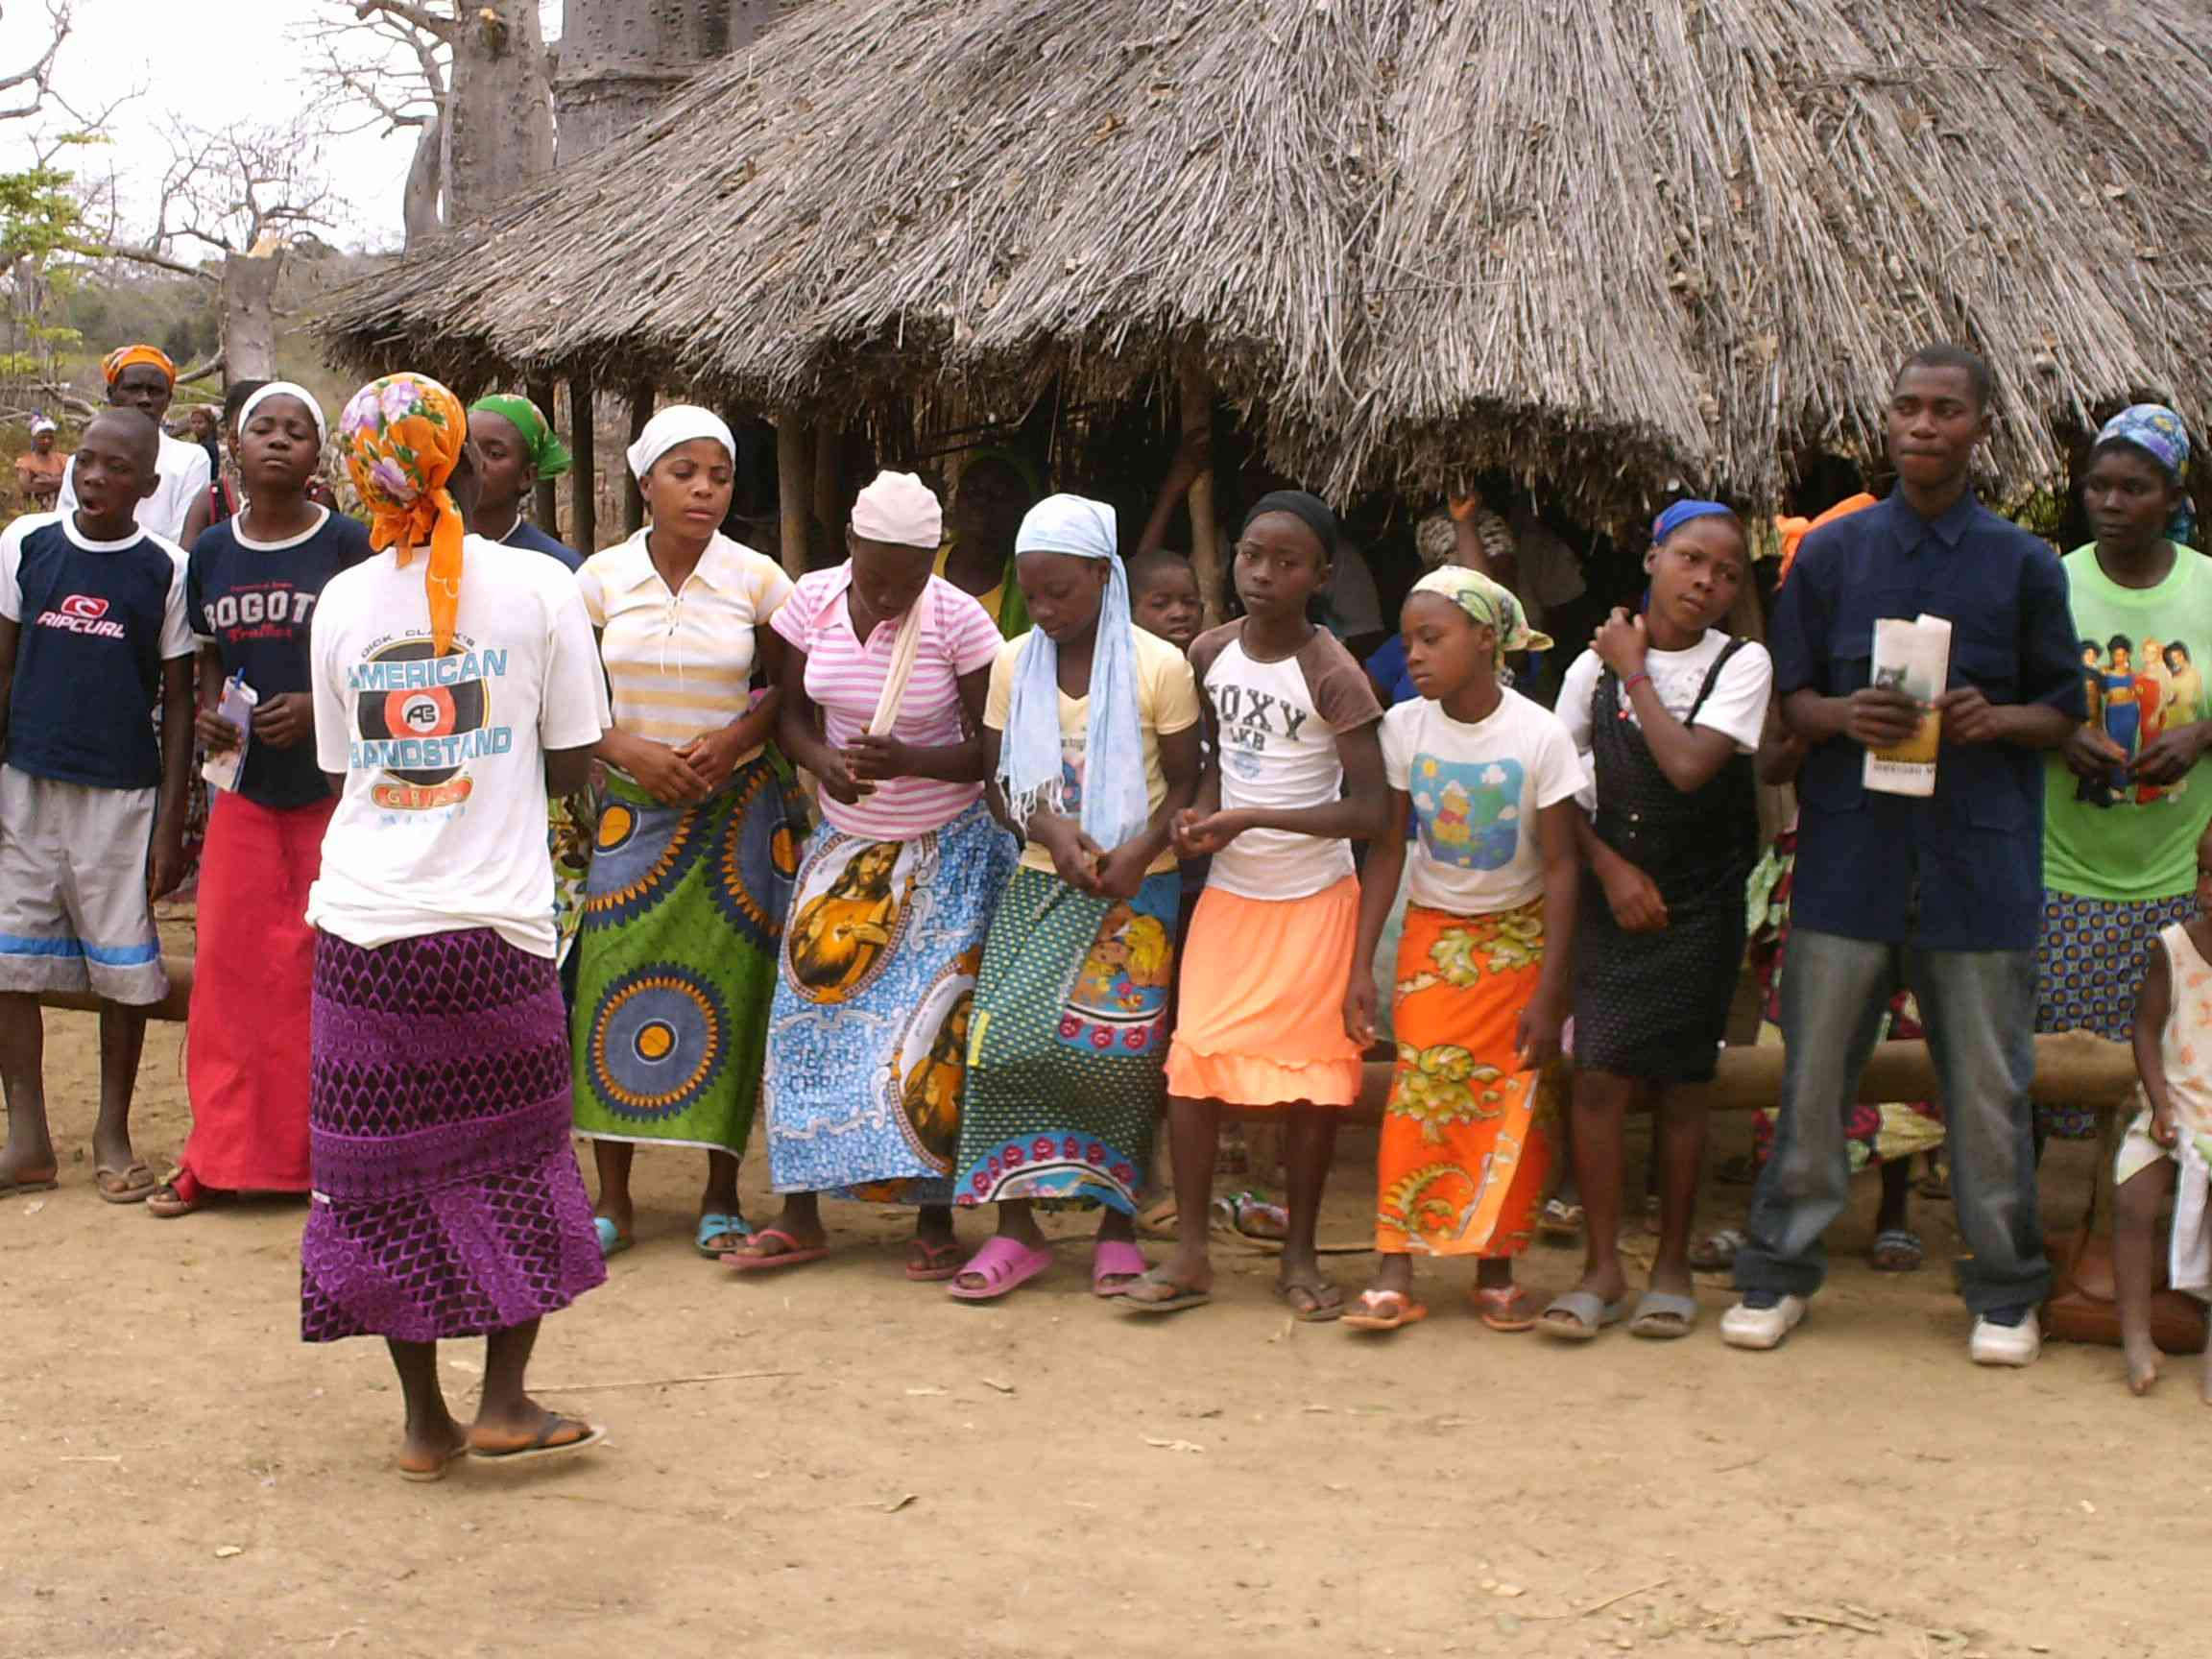 Sept 11 -13: Luandos Village Field Trip | Angola Field Groupangola village